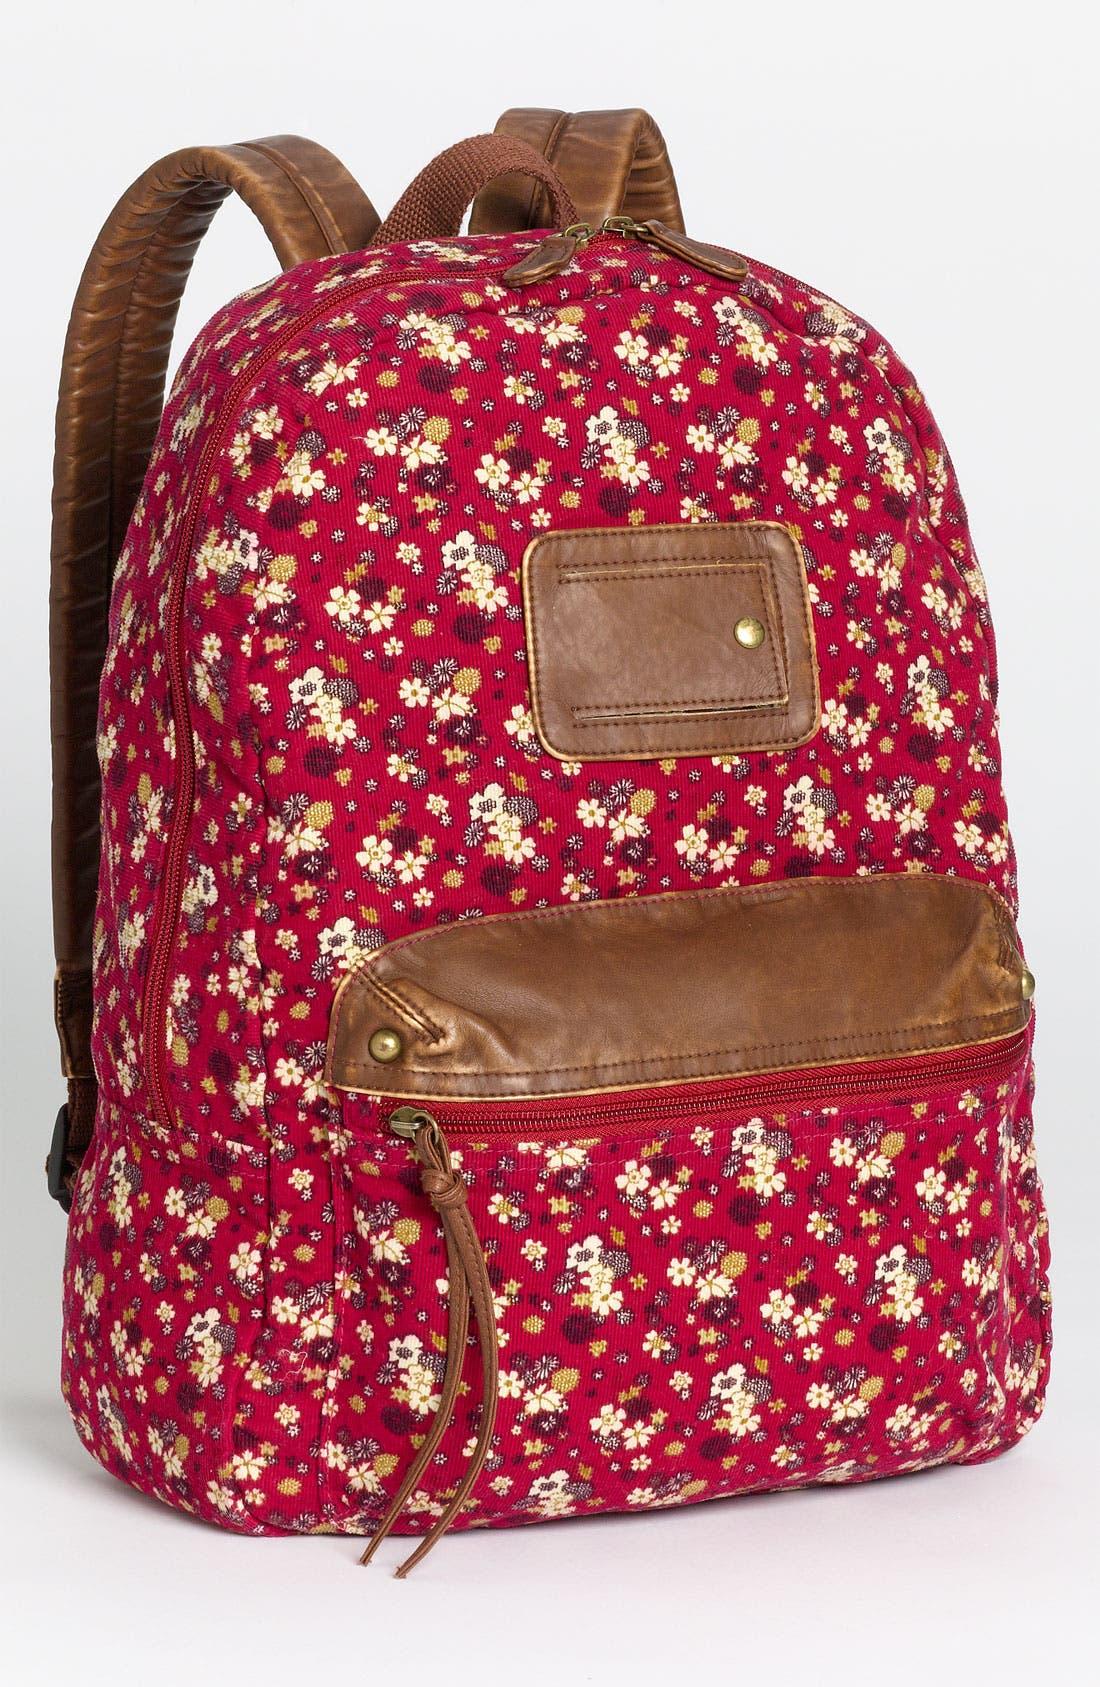 Alternate Image 1 Selected - Fantasia Accessories Print Backpack (Girls)